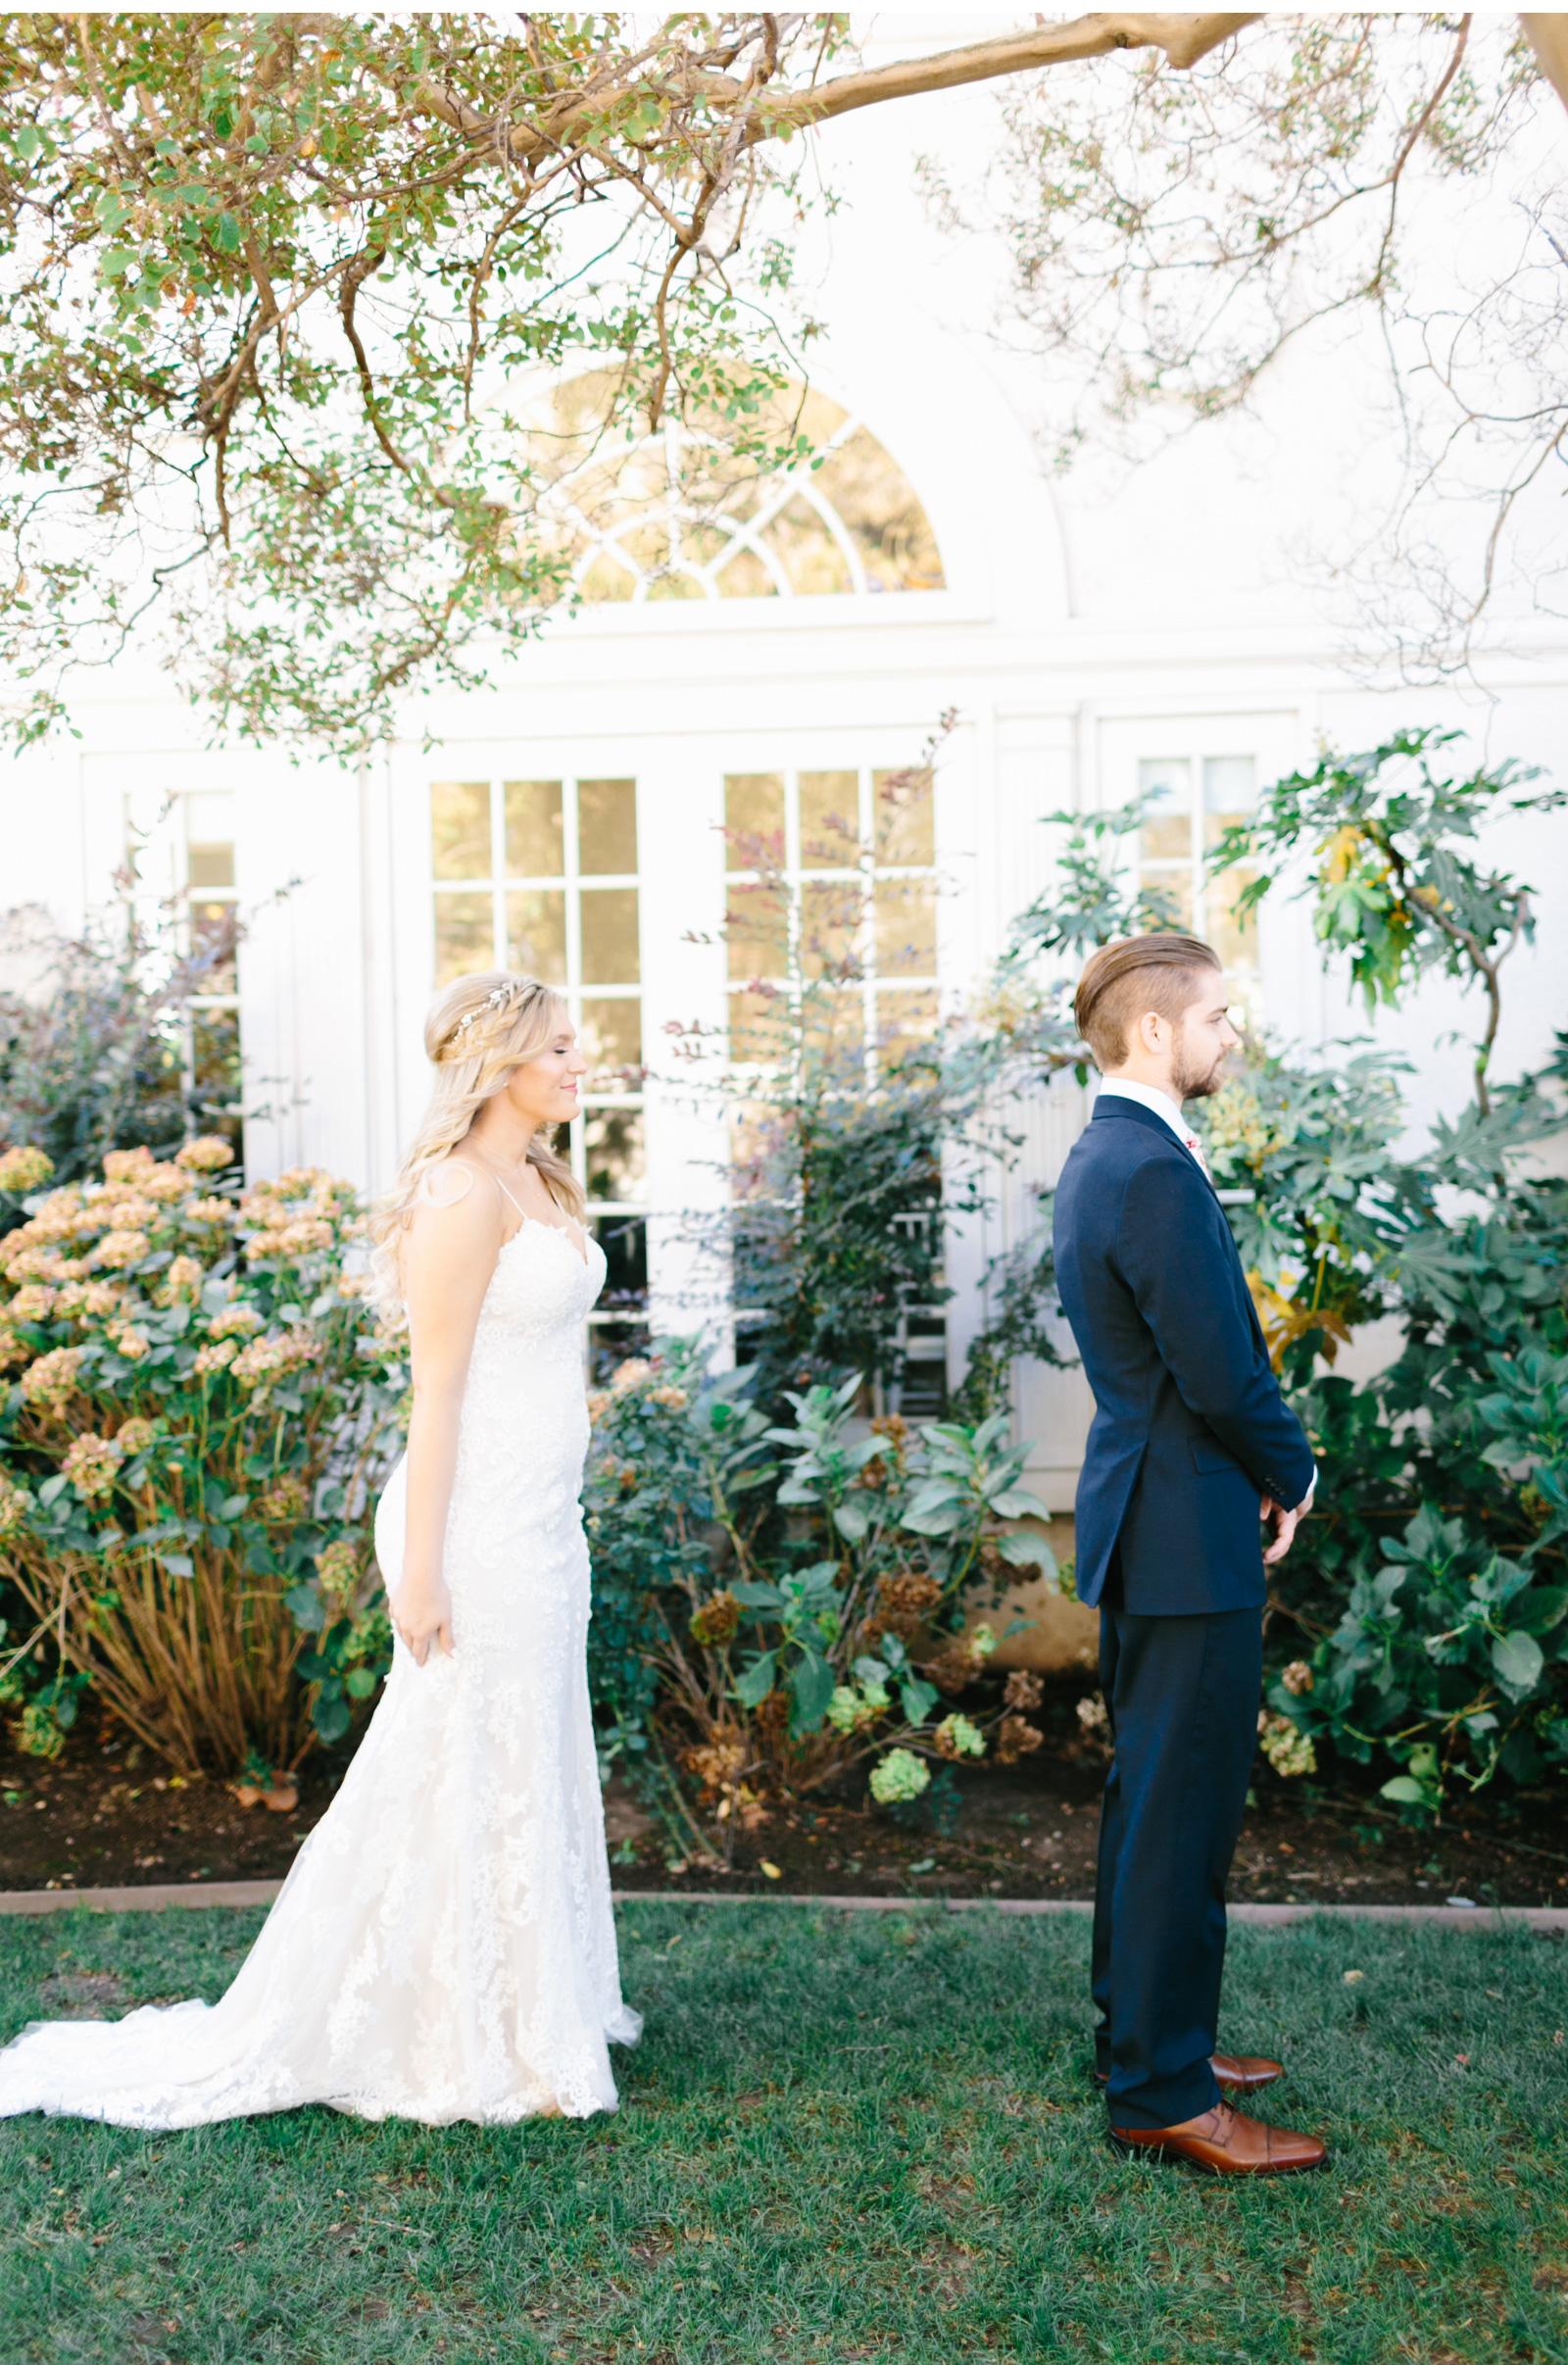 Malibu-Wedding-Photographer-Natalie-Schutt-Photography-Vizcaya_11.jpg